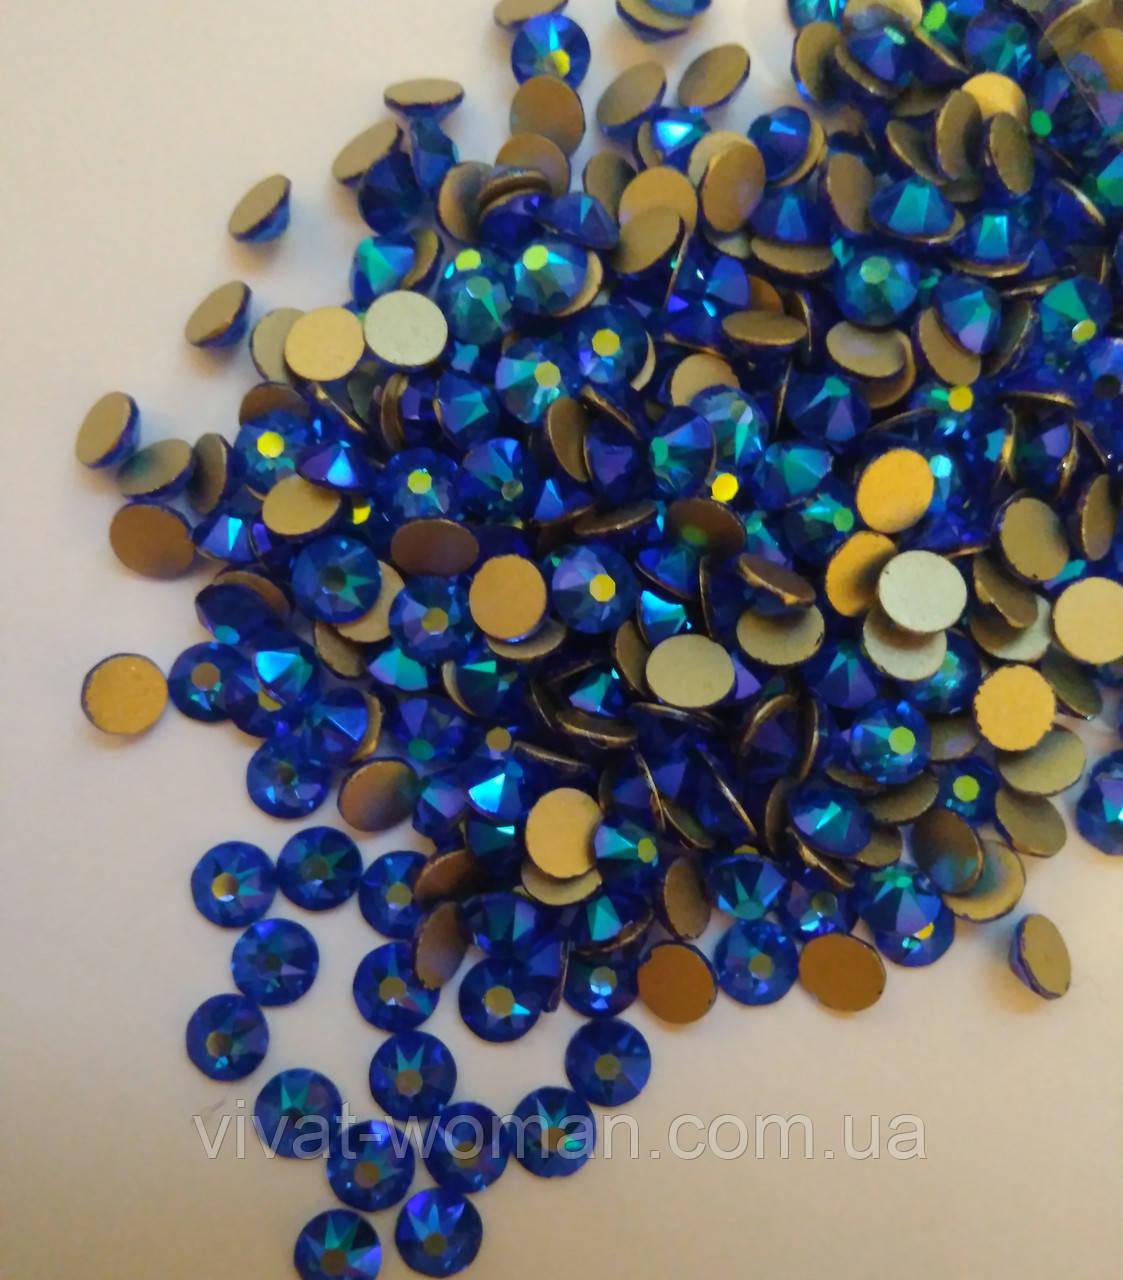 Стразы холодной фиксации Xirius SS20 (5,0 мм) Sapphire AB, 16 граней. Цена за 144 шт